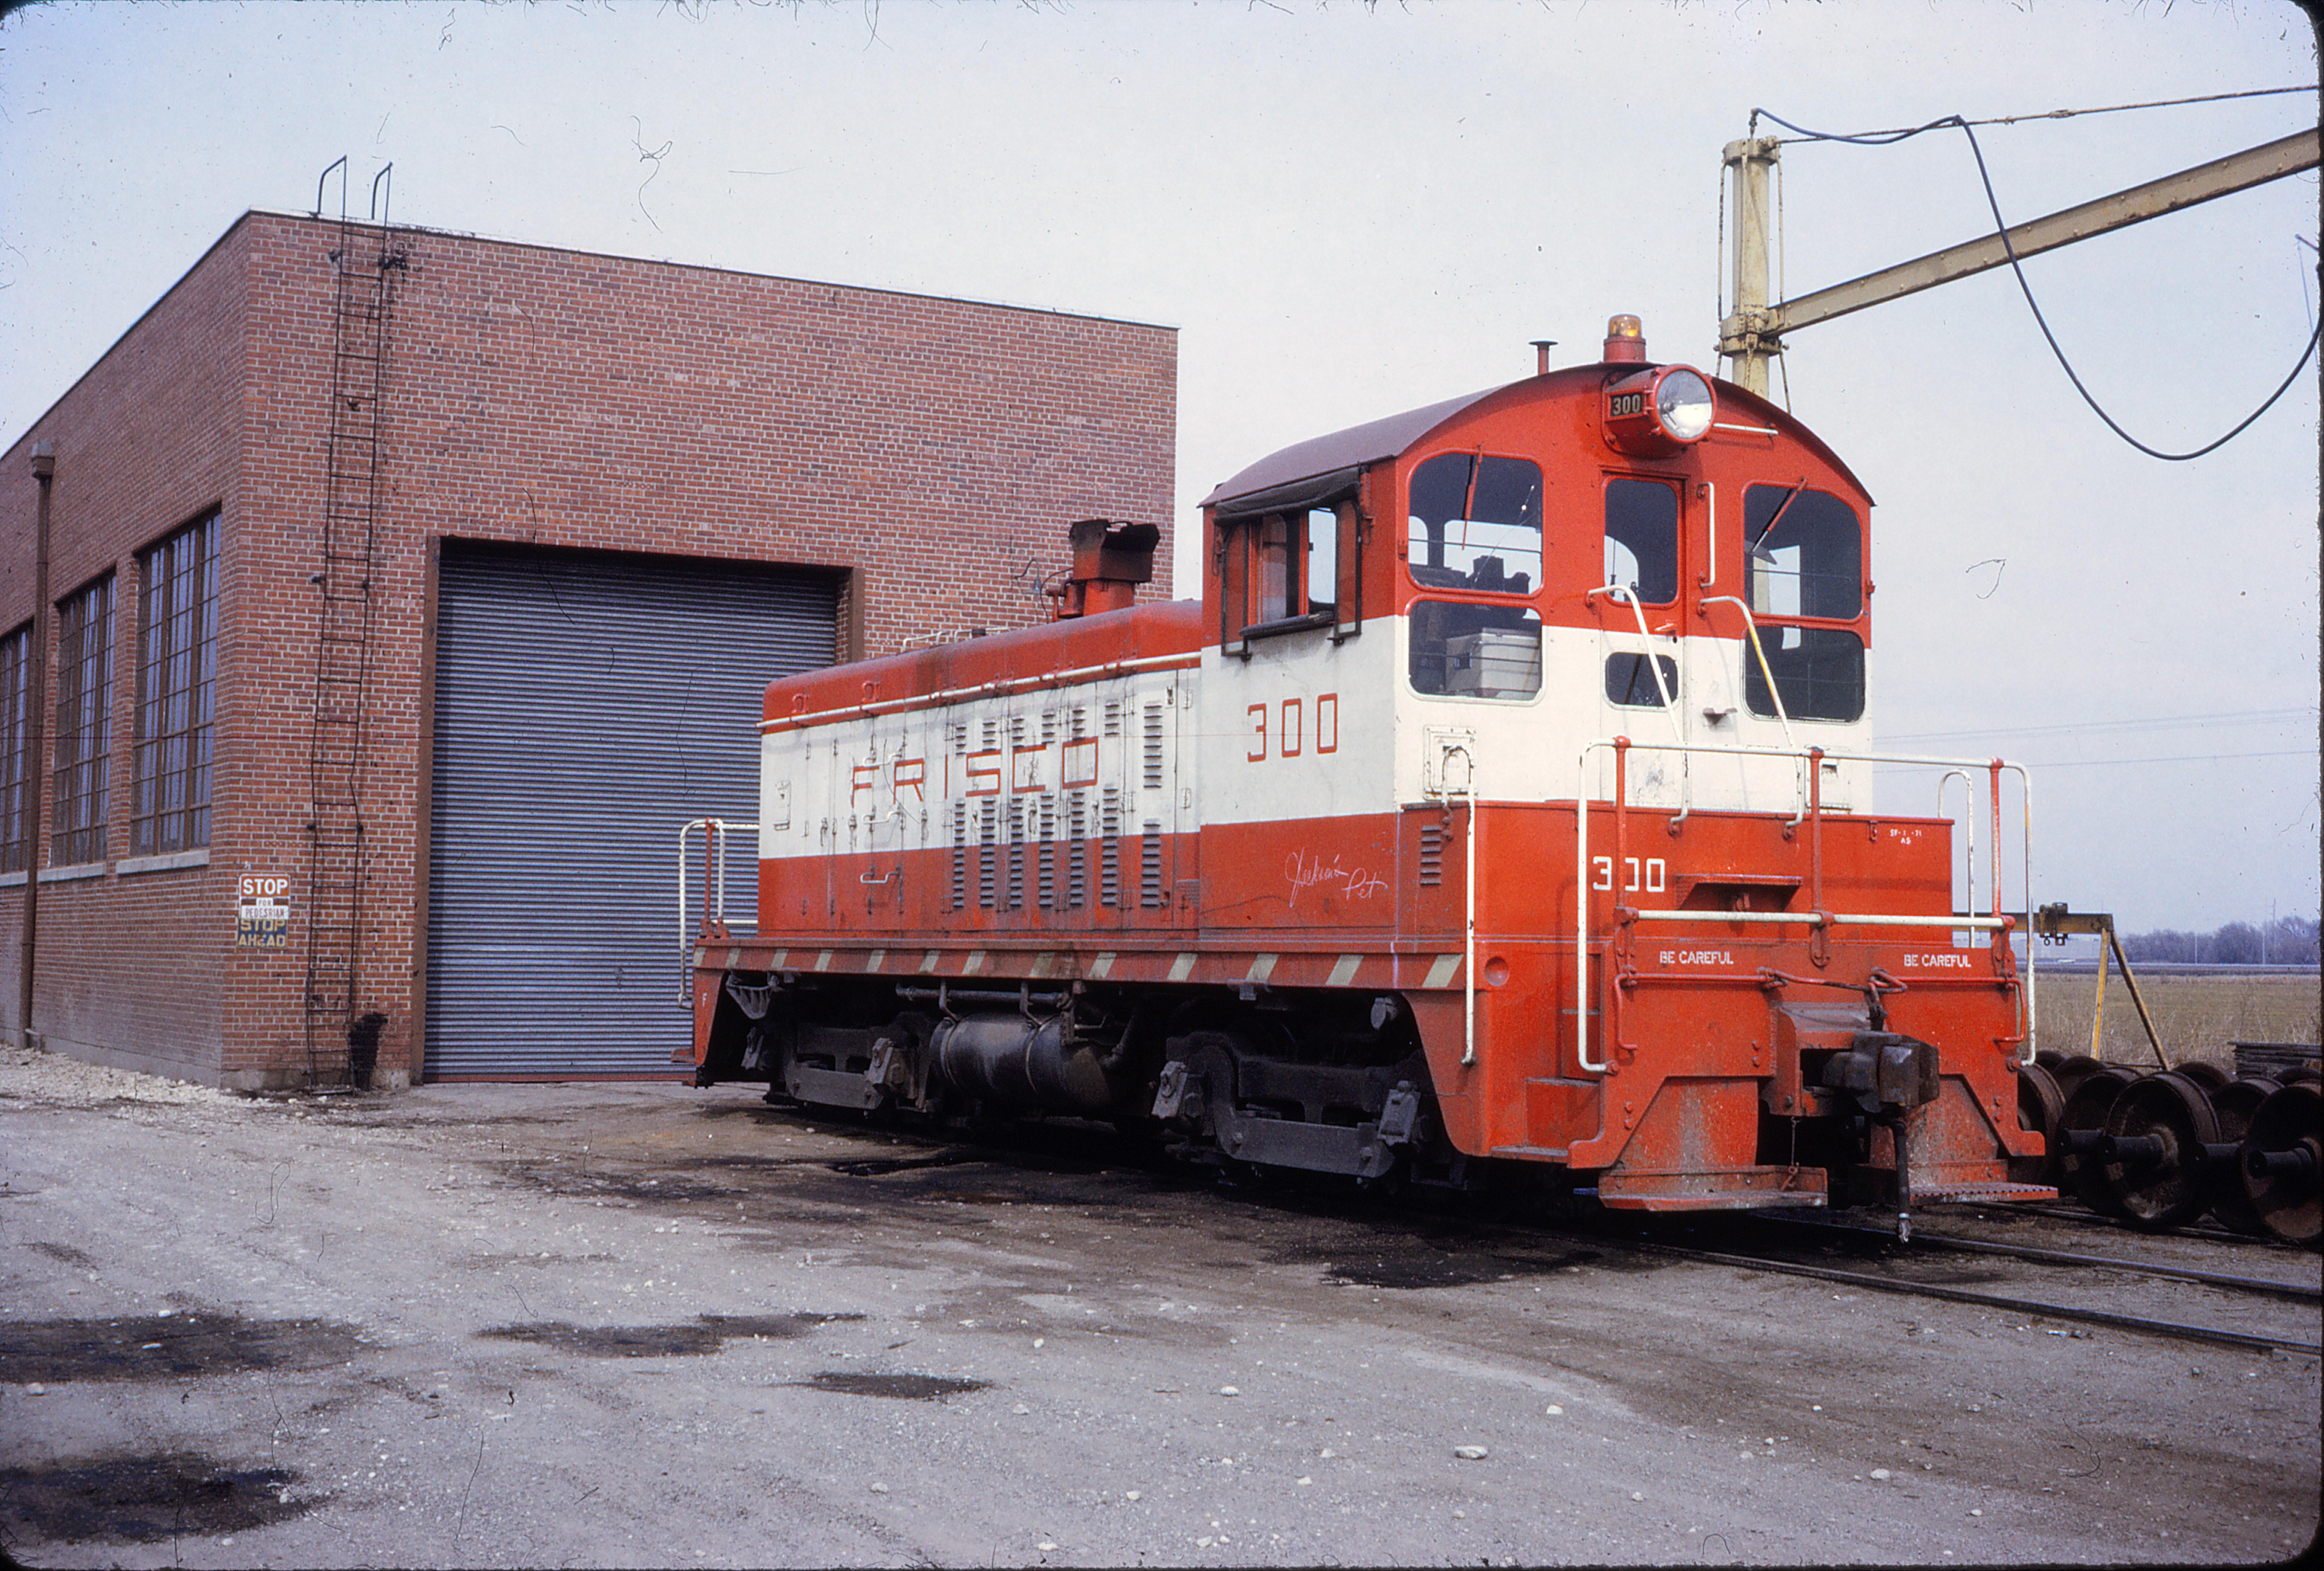 SW7 300 at Wichita, Kansas in March 1972